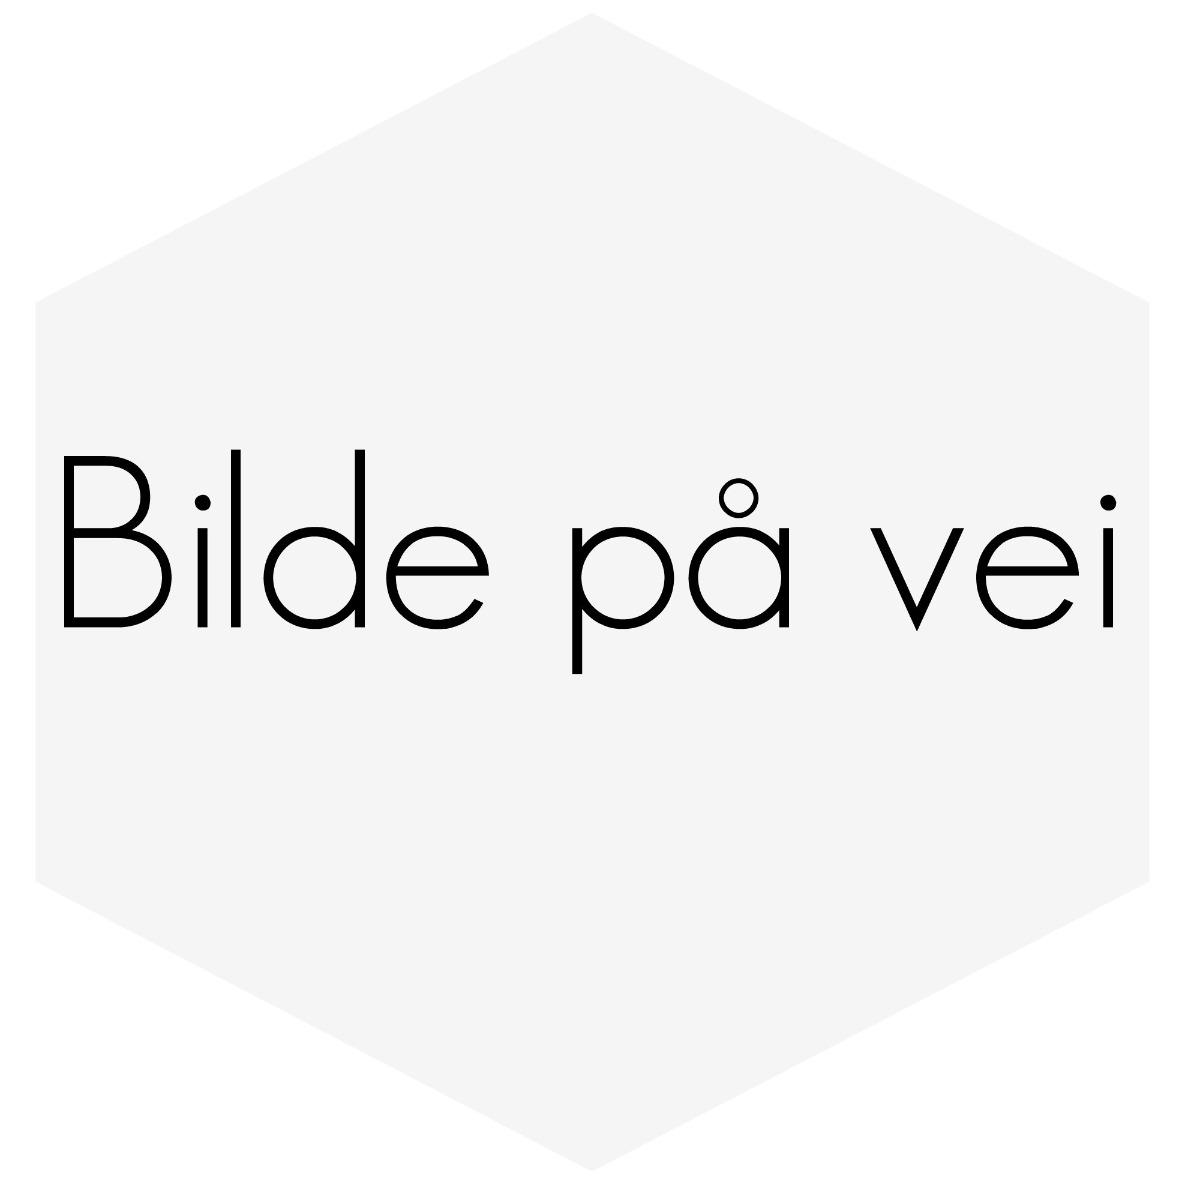 VANNPUMPE TIL VOLVO 760/960,B28,280, 83-90 1269874